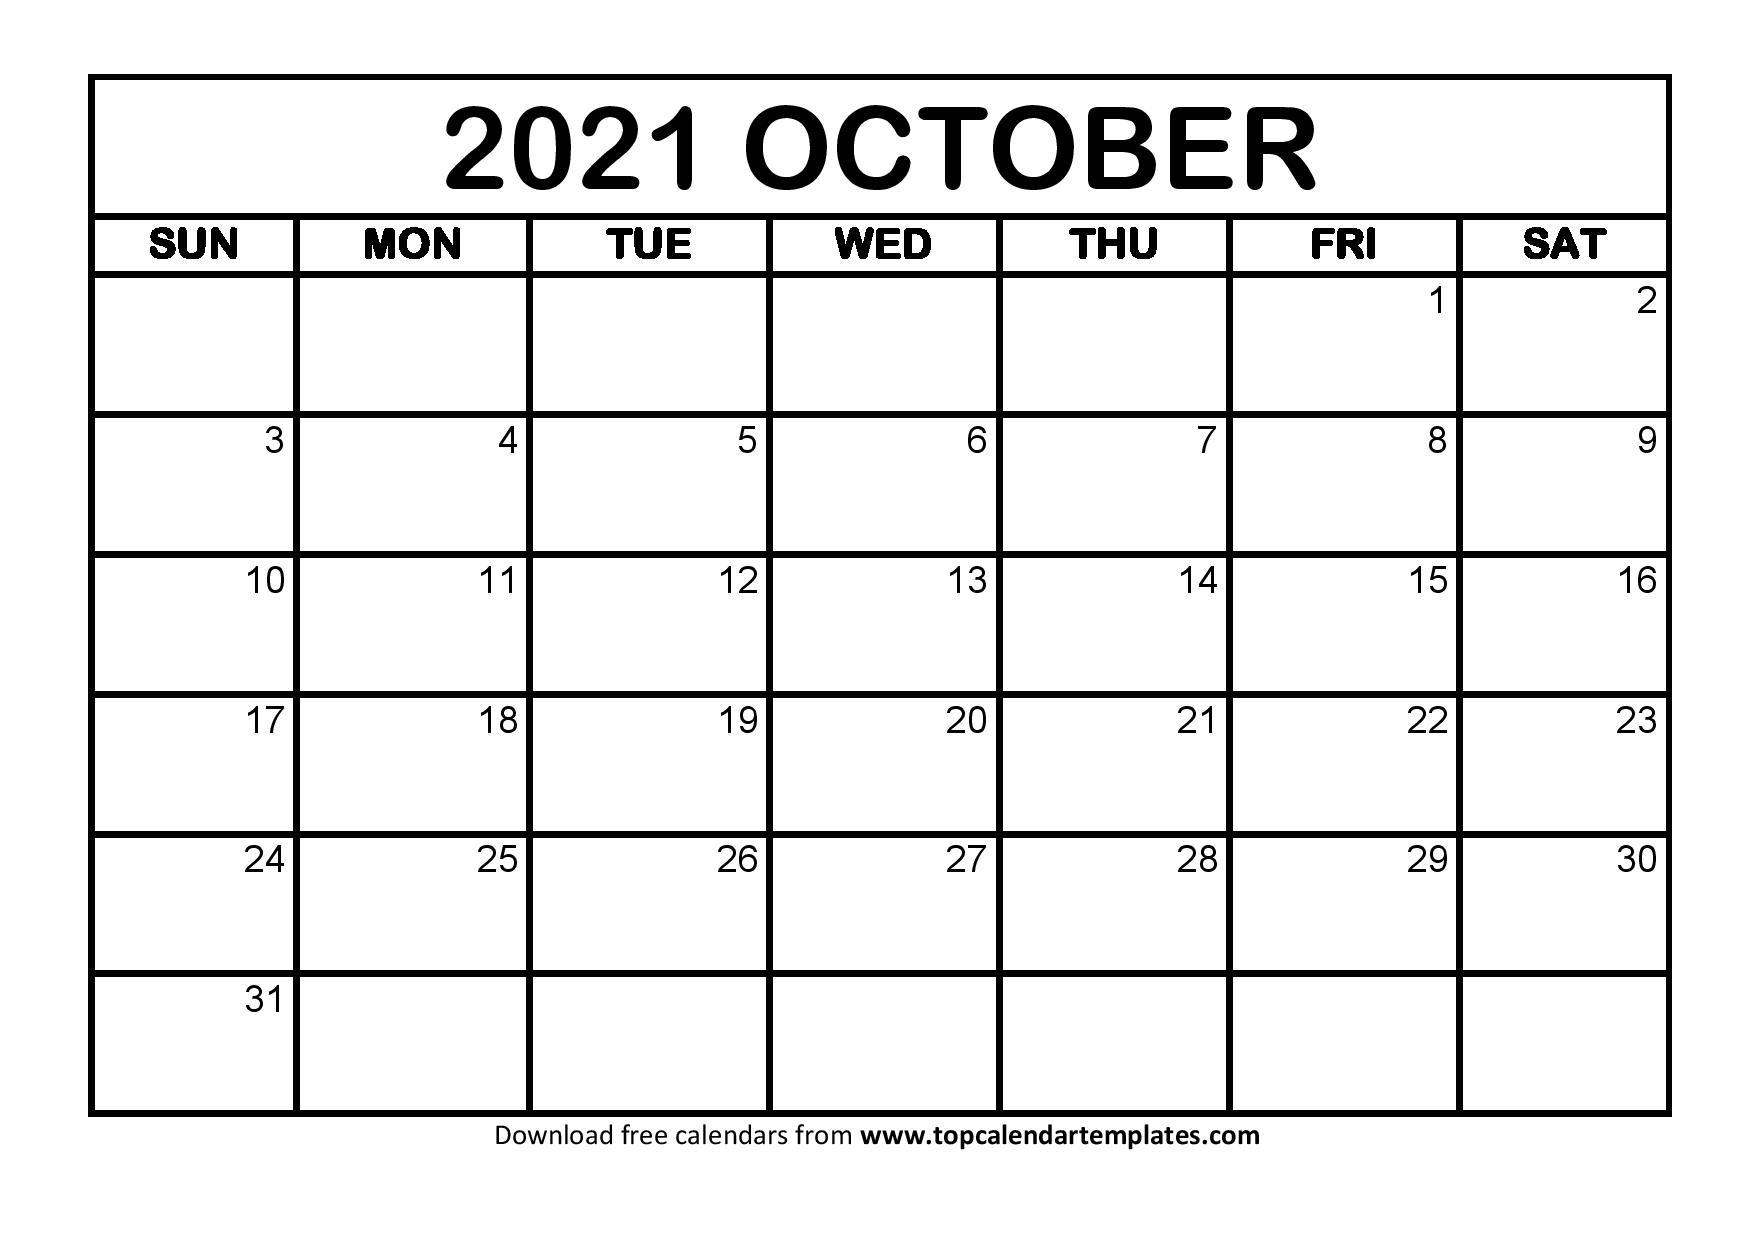 October 2021 Calendar Editable Printable | Monthly Calendar